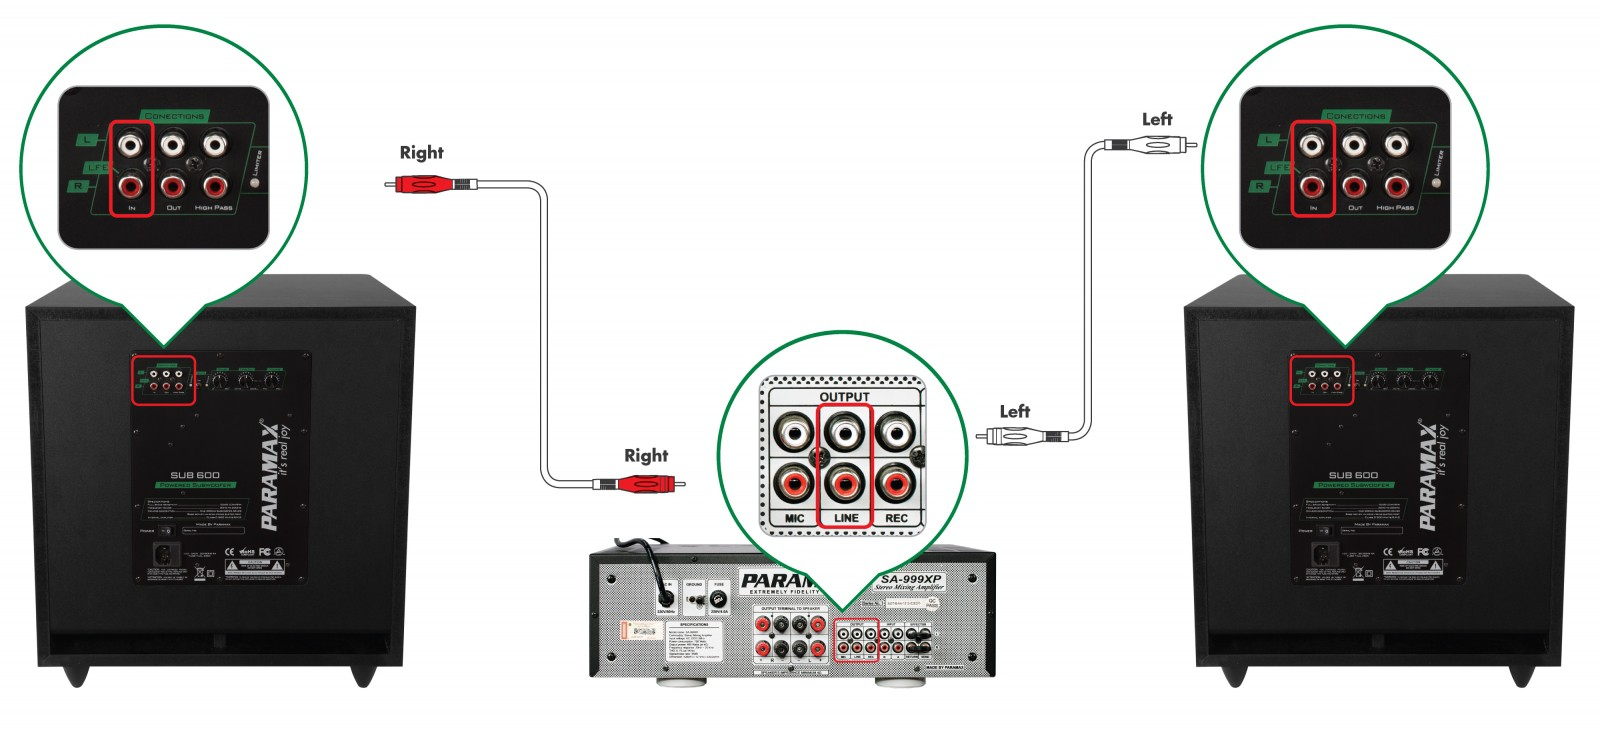 Sơ đồ kết nối Ampli với 2 loa Full